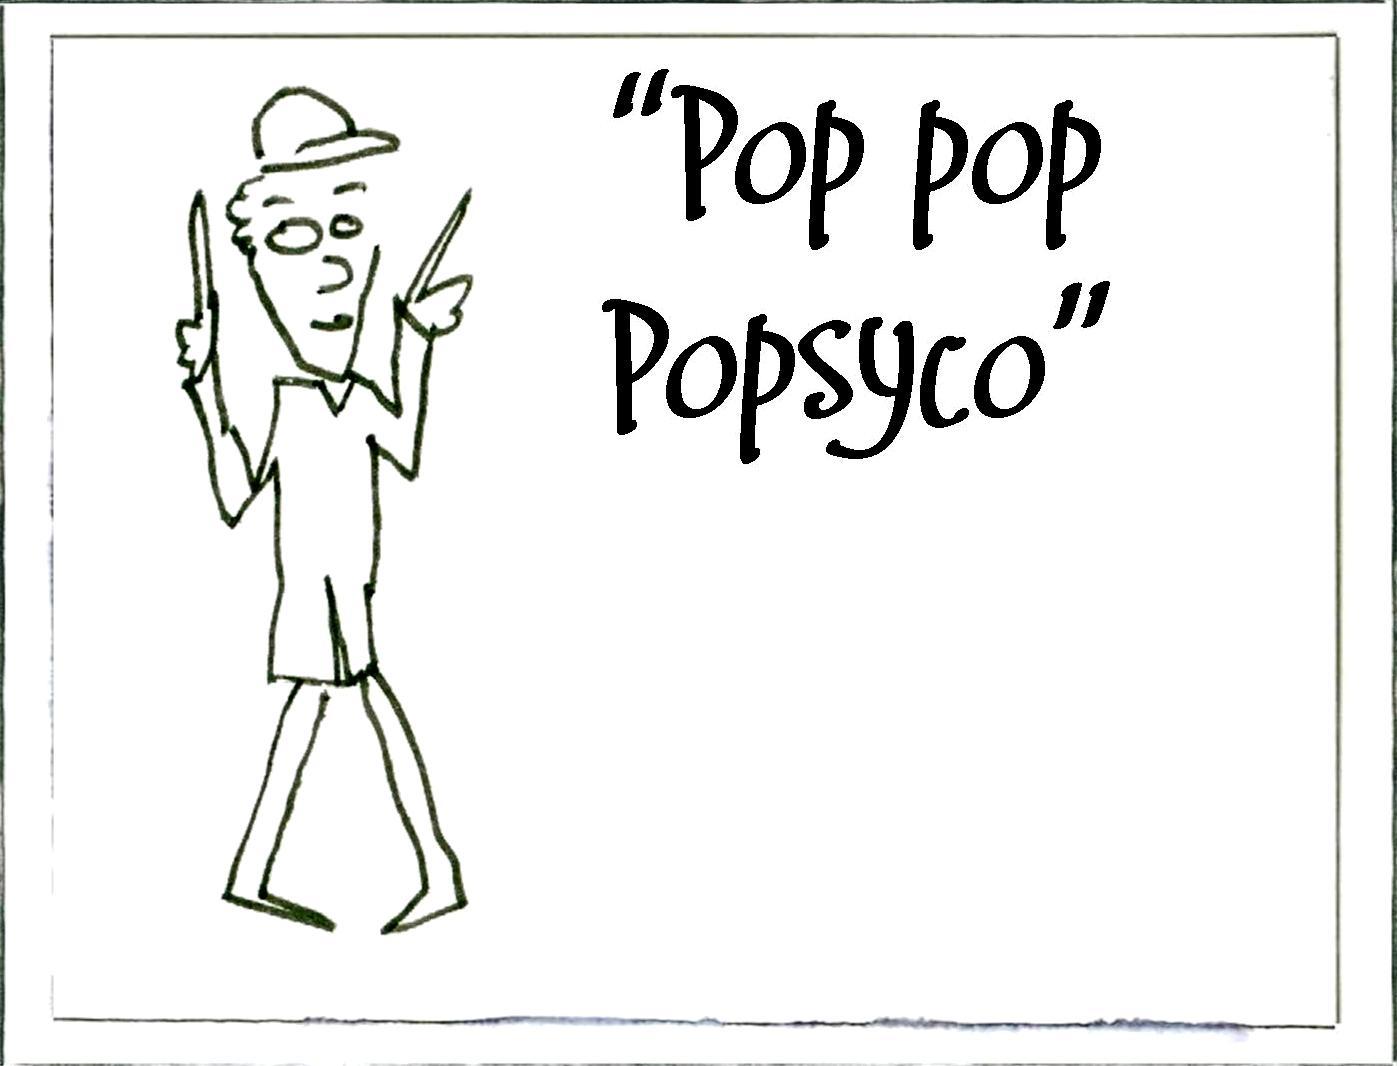 pop pop 1 boxed